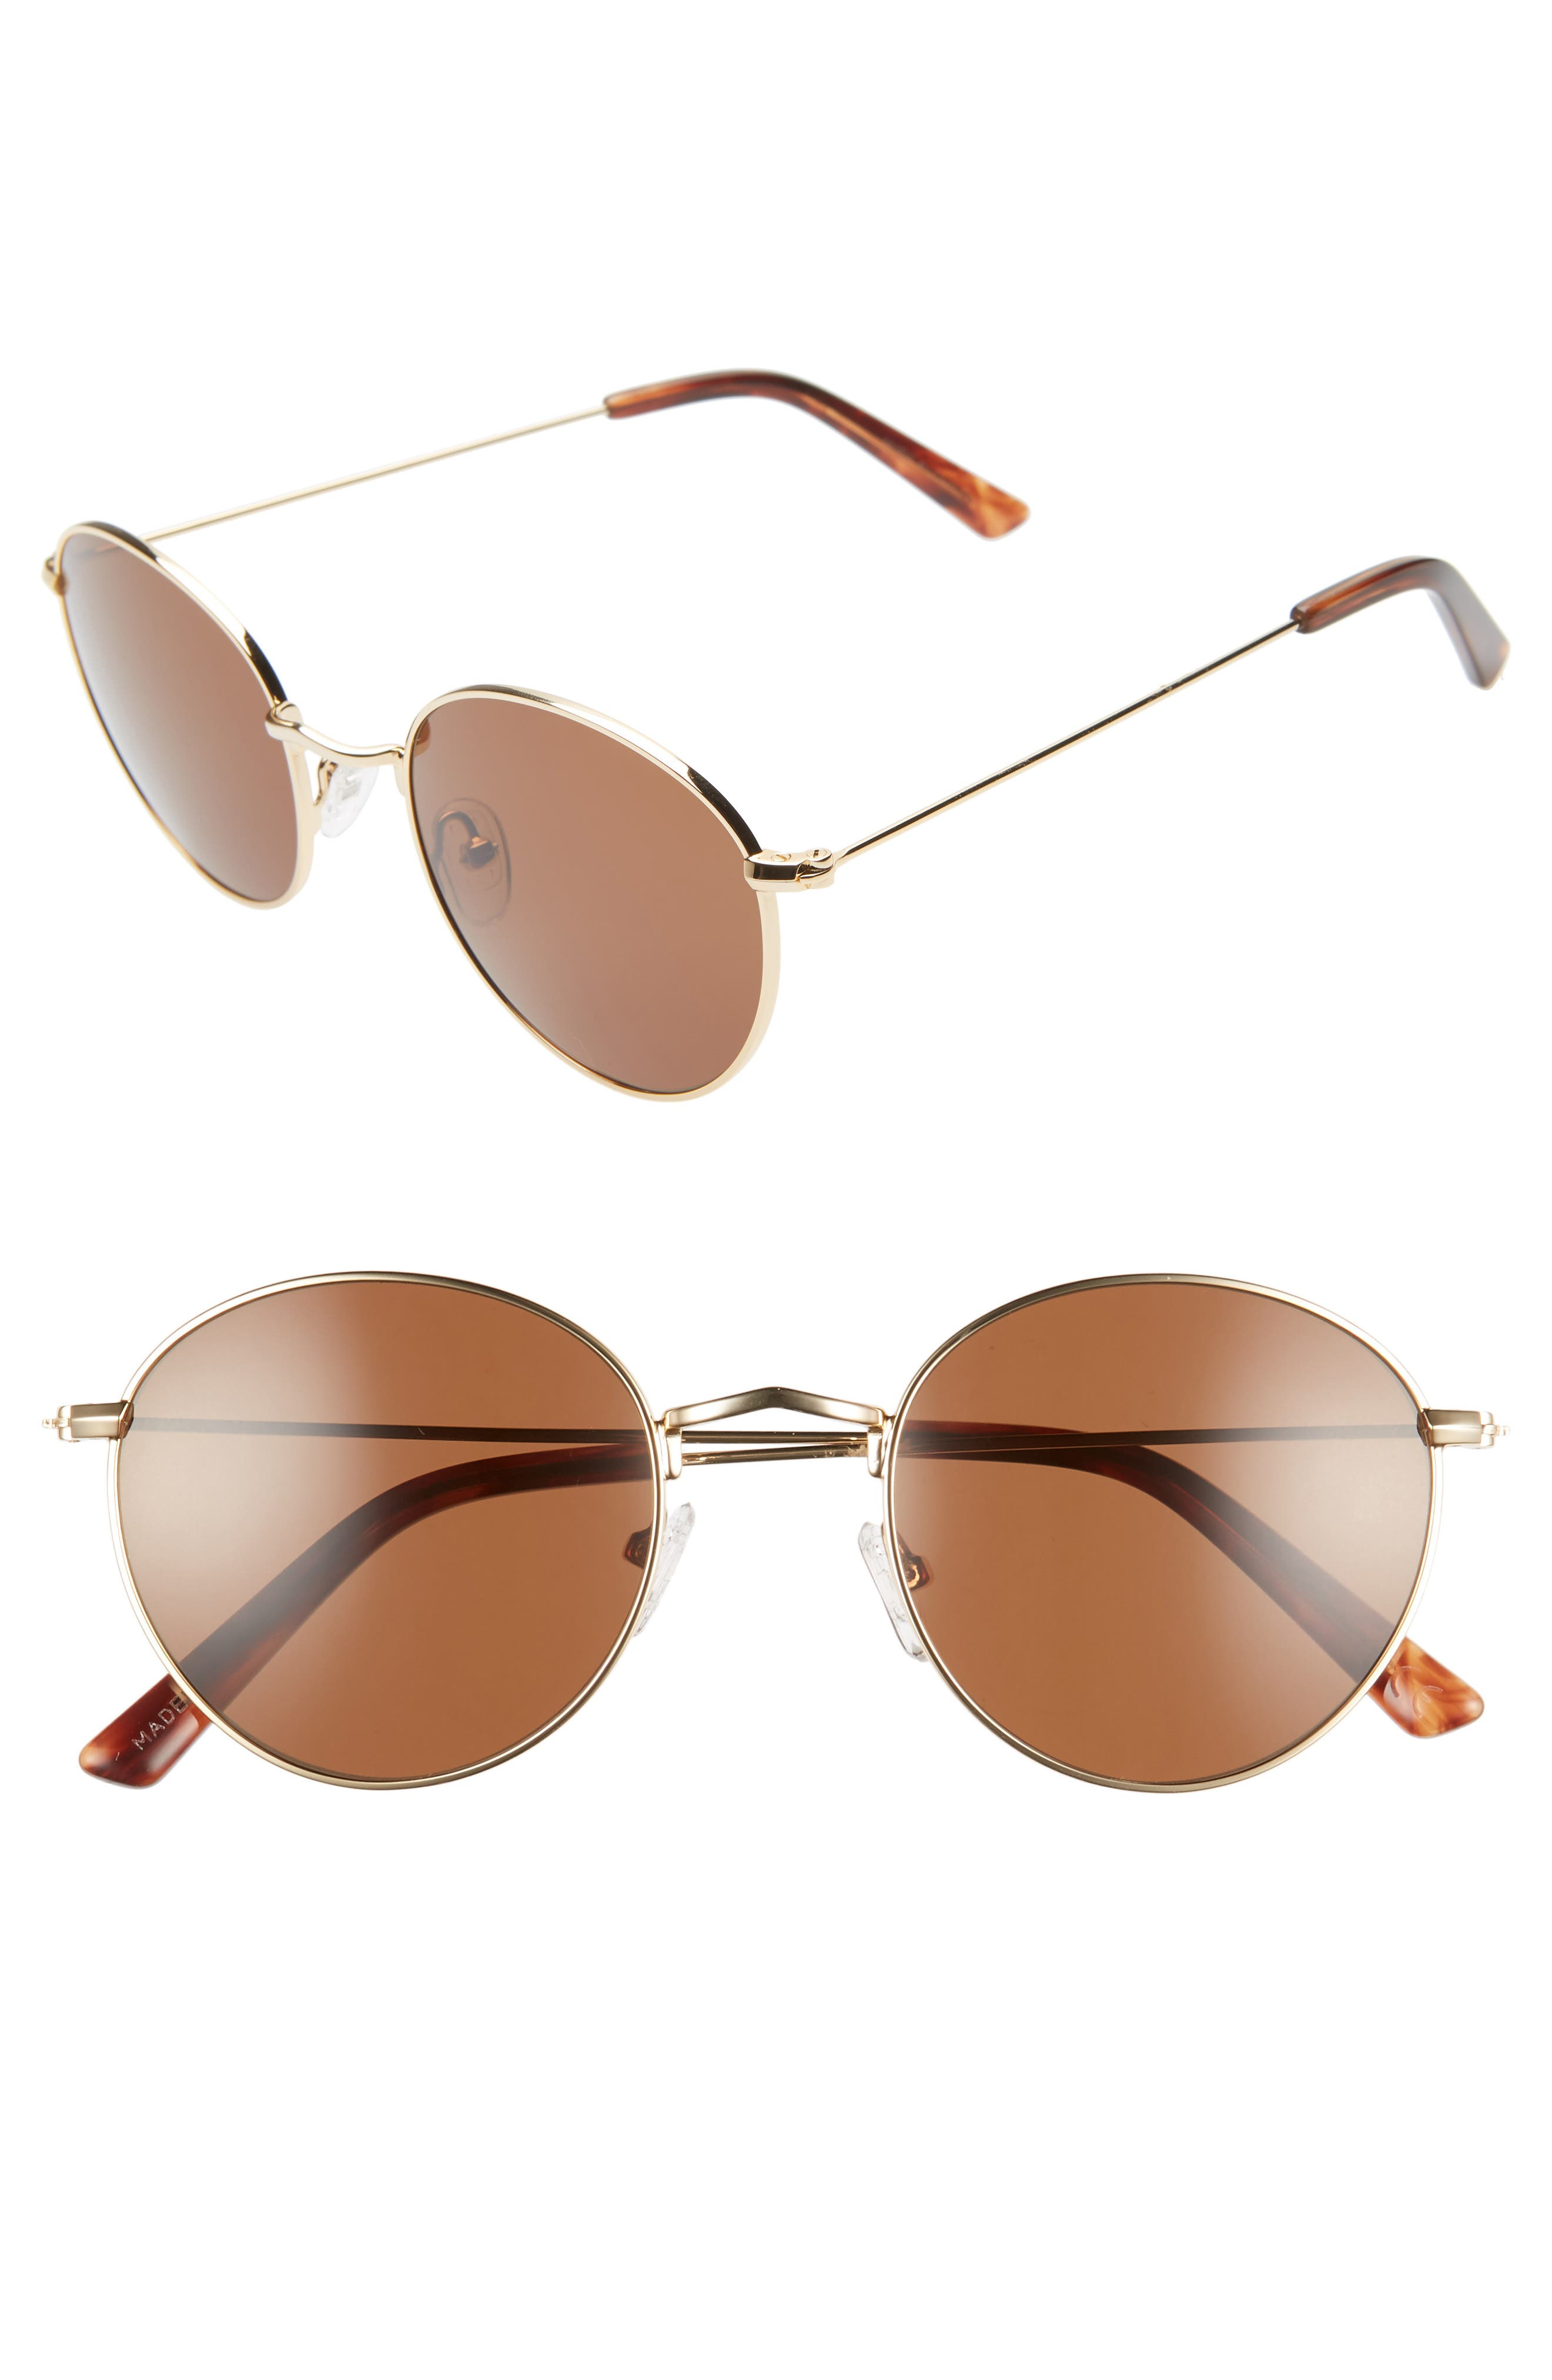 Madewell Fest 50Mm Aviator Sunglasses - Gold/ Brown